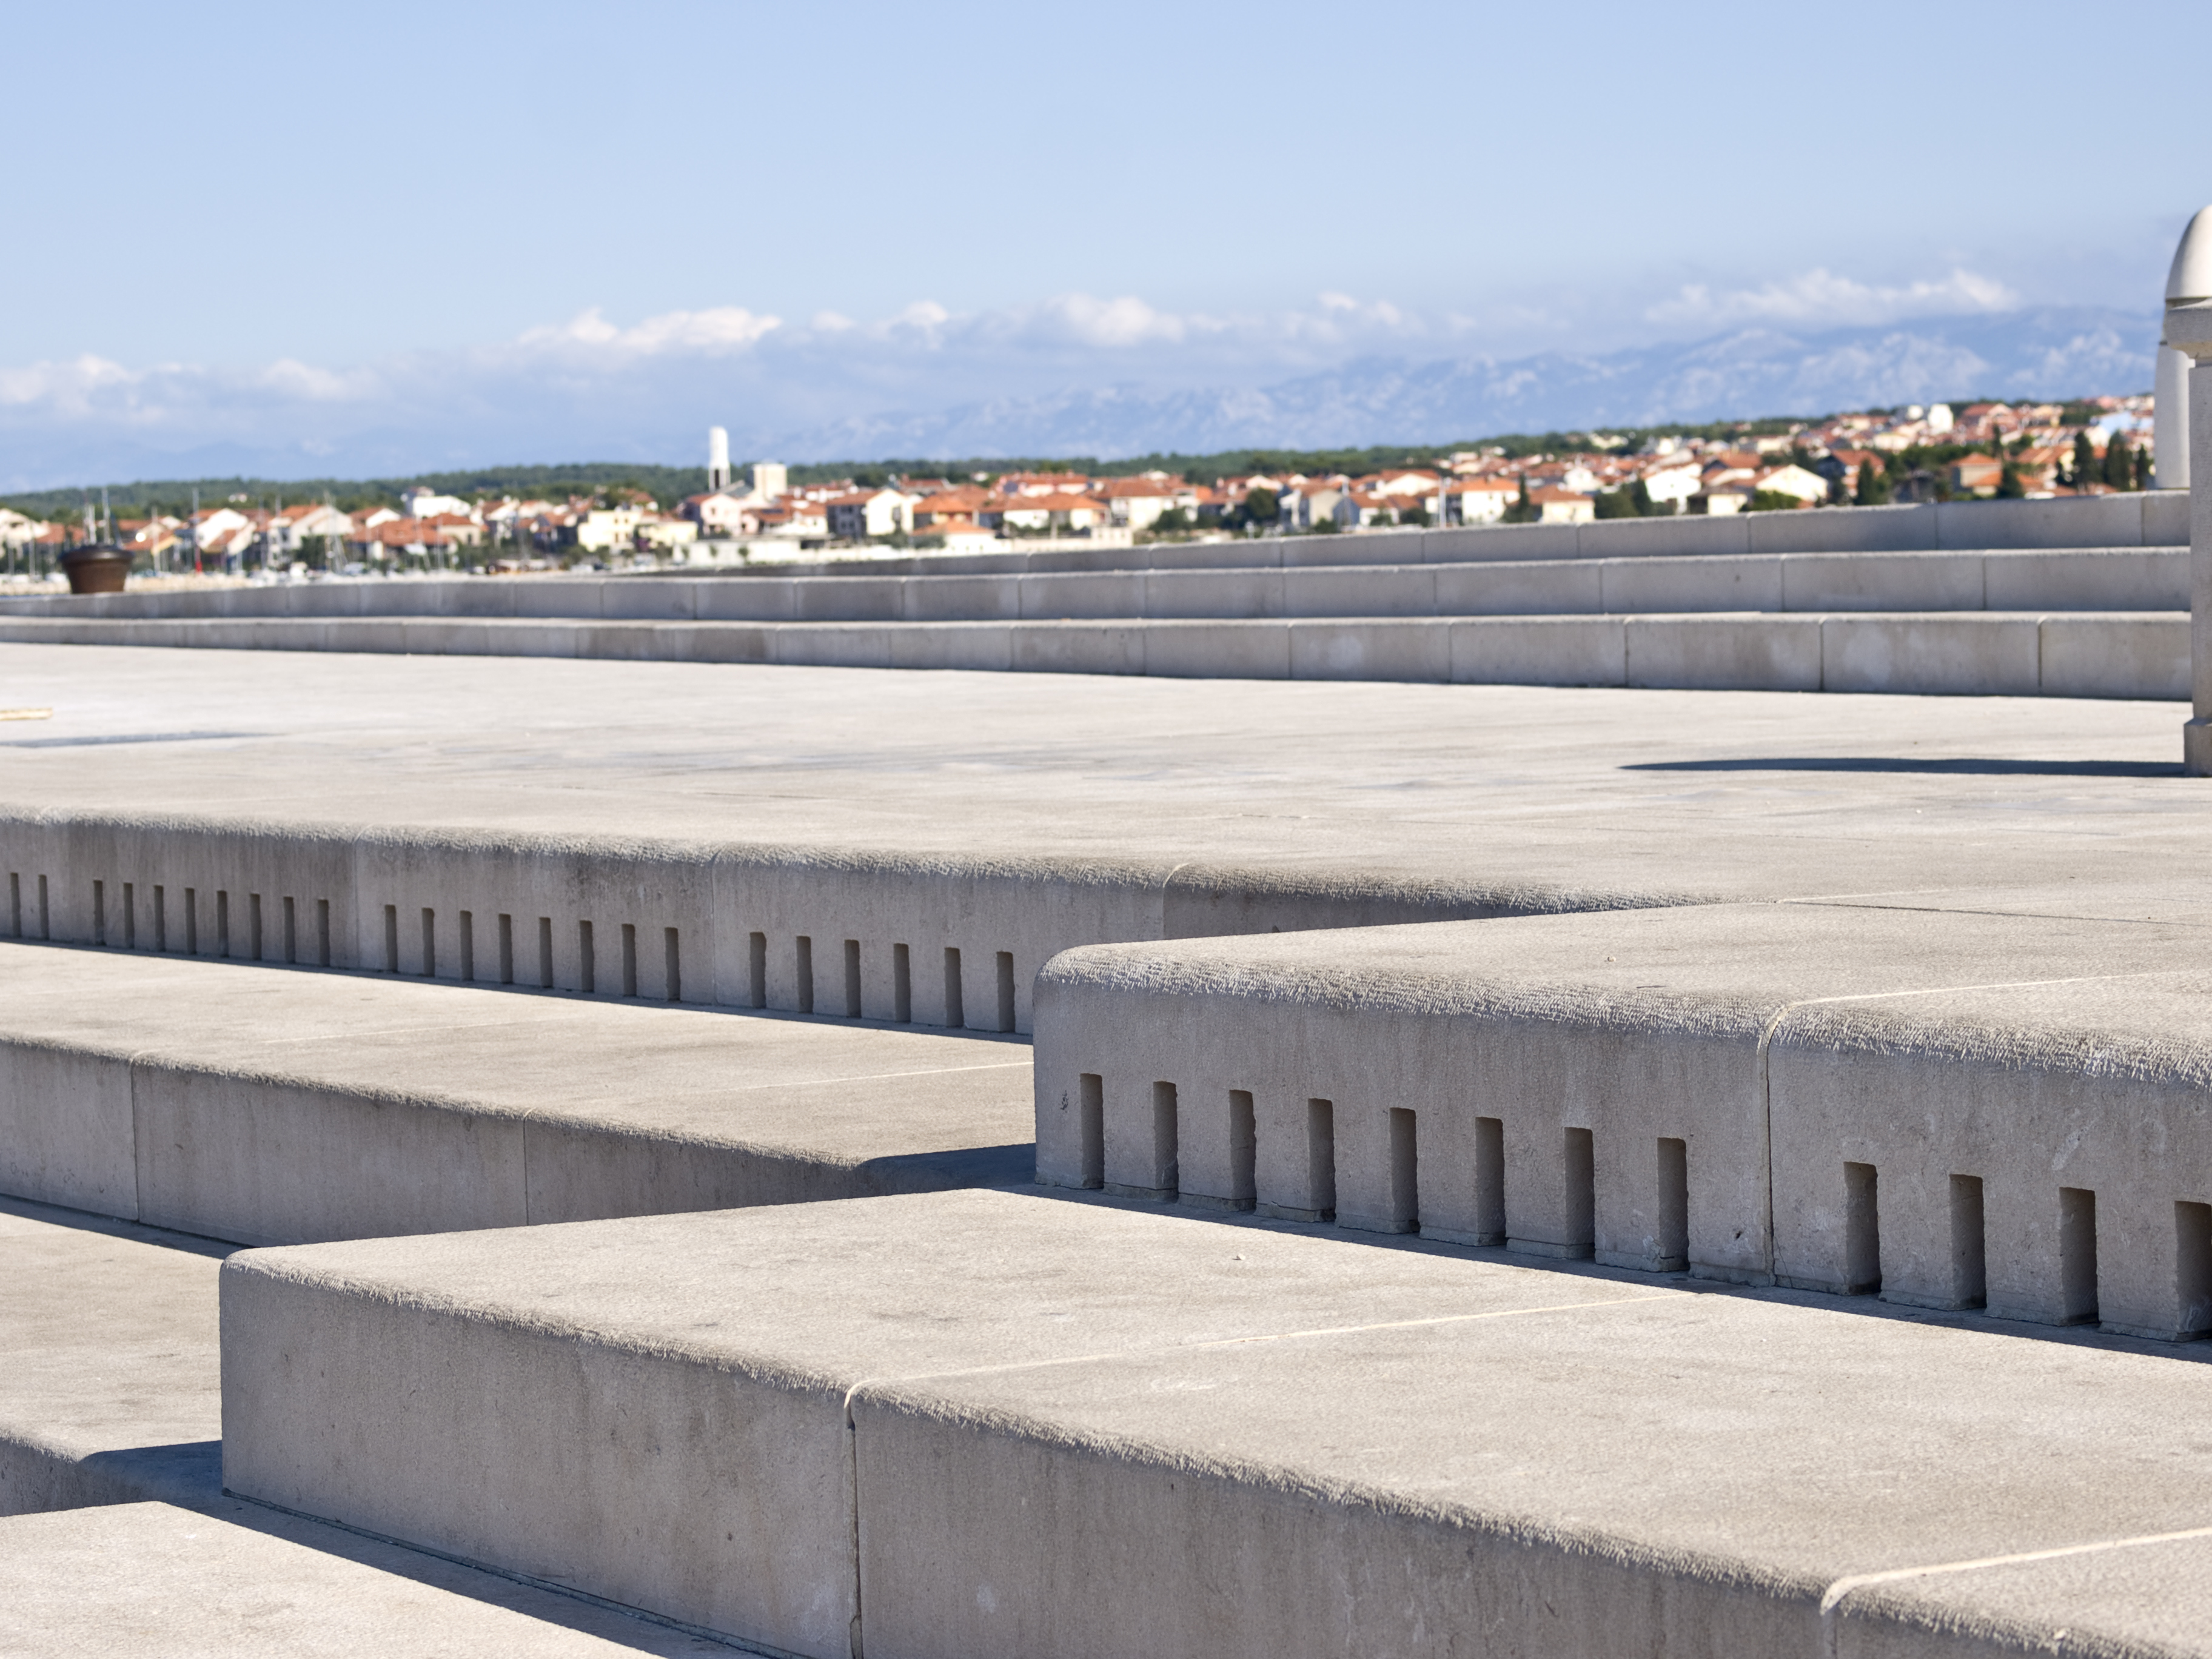 ¿Sabes que el mar toca un instrumento en Zadar? - Croacia Circuito Gran Tour de Croacia e Istria